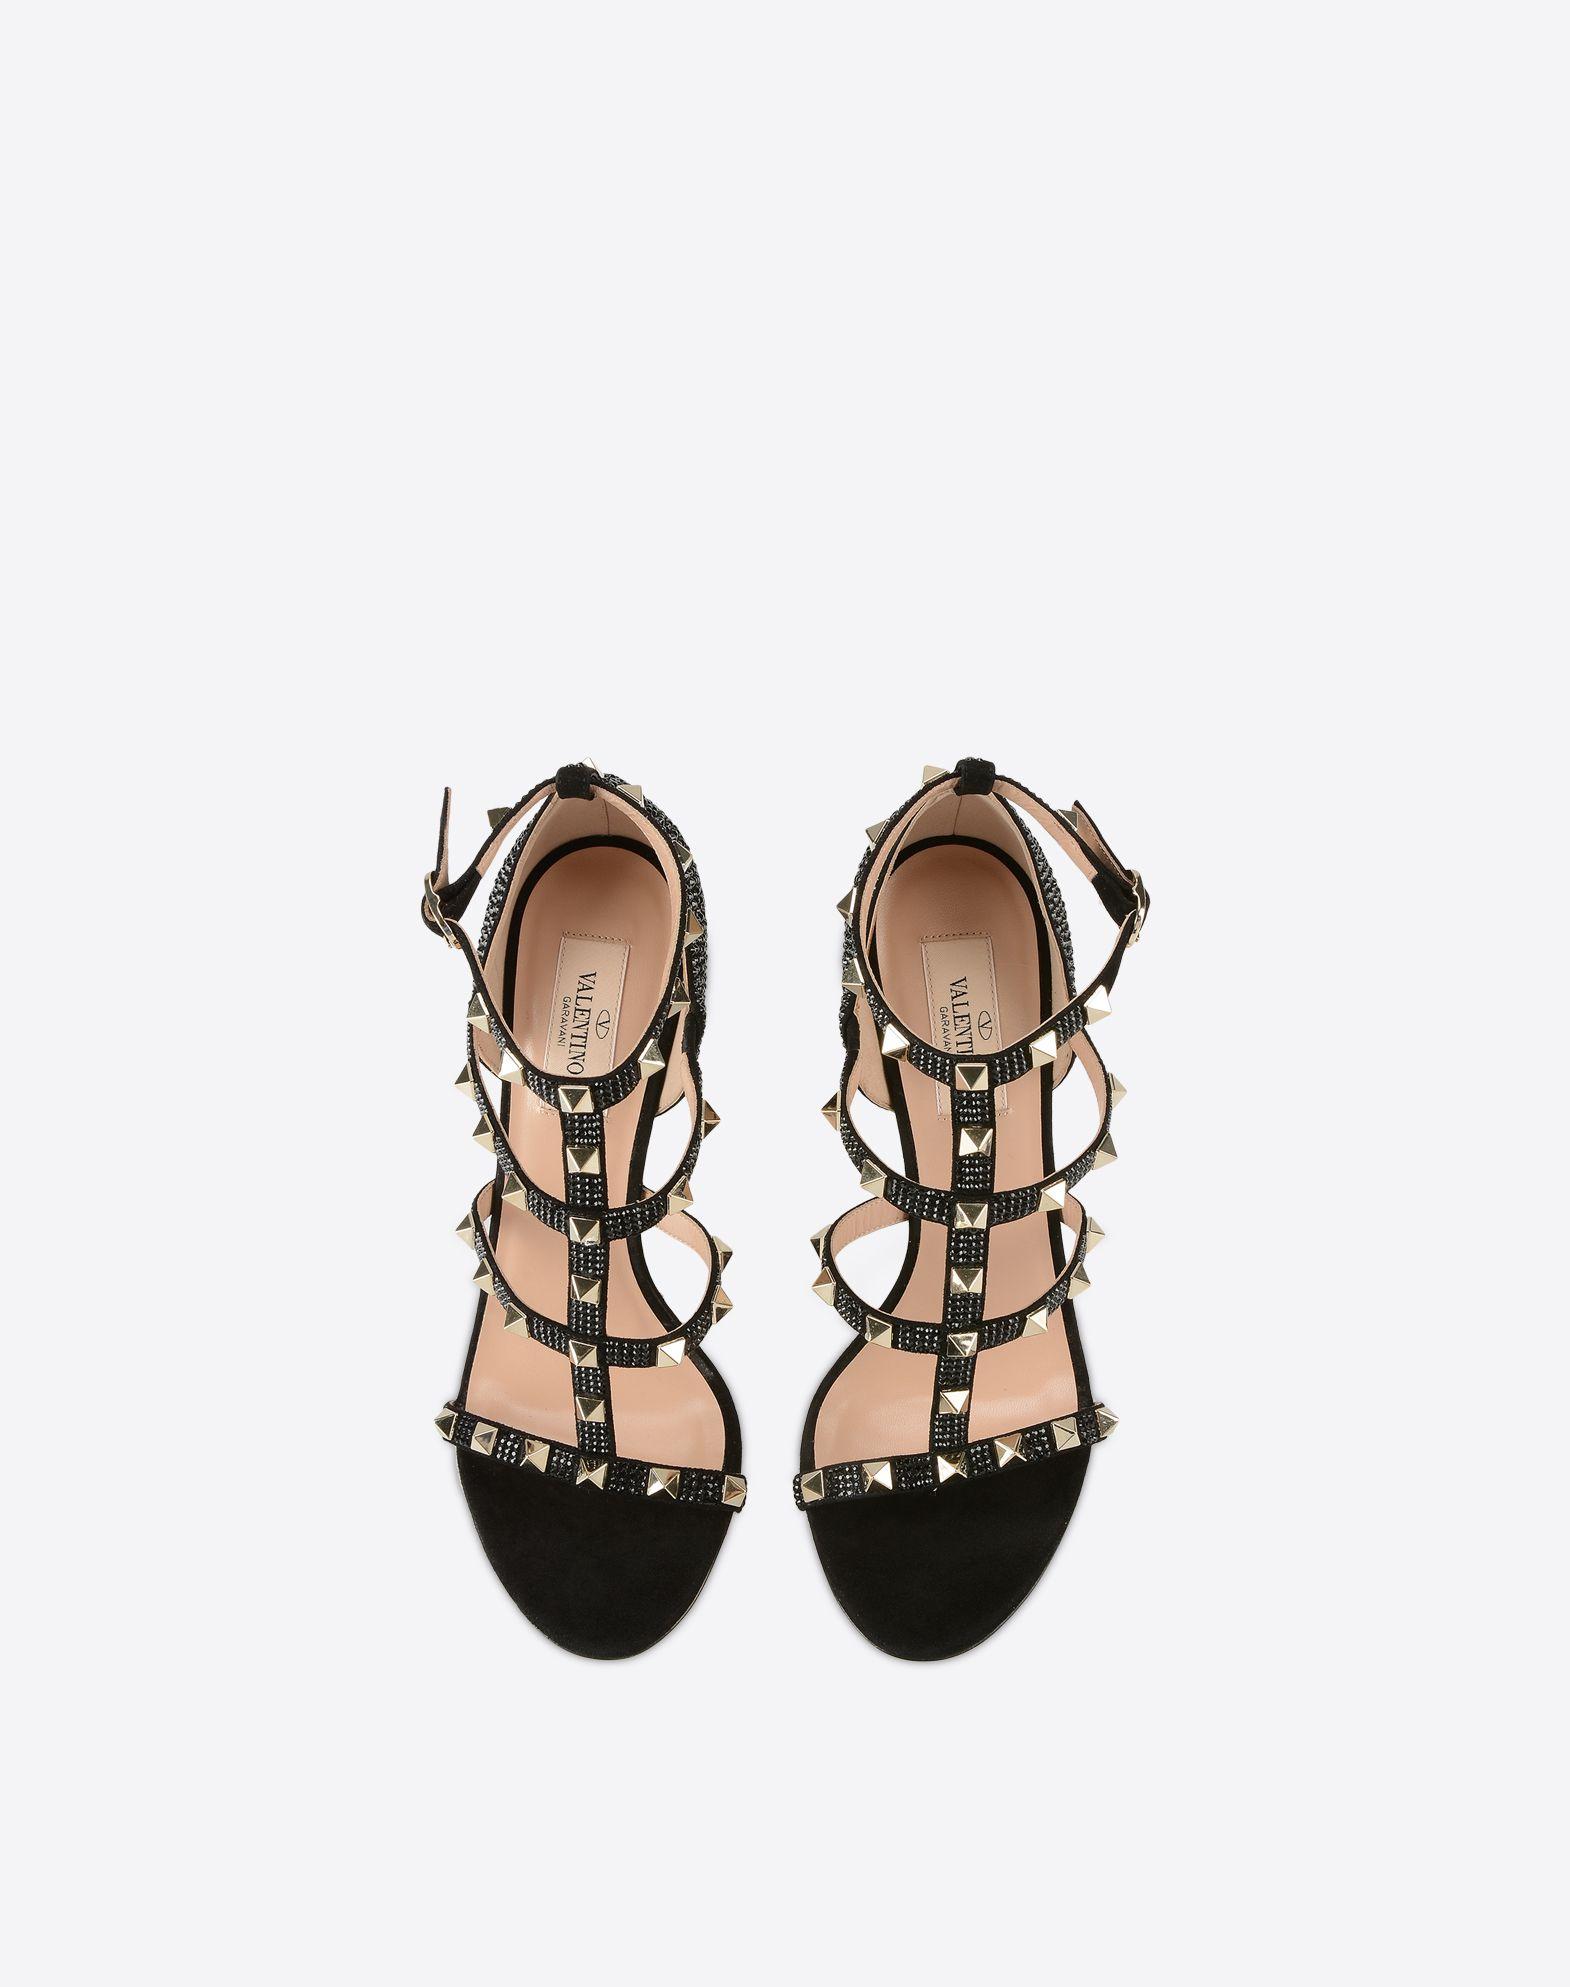 VALENTINO GARAVANI Rockstud sandal with crystals Sandal D e